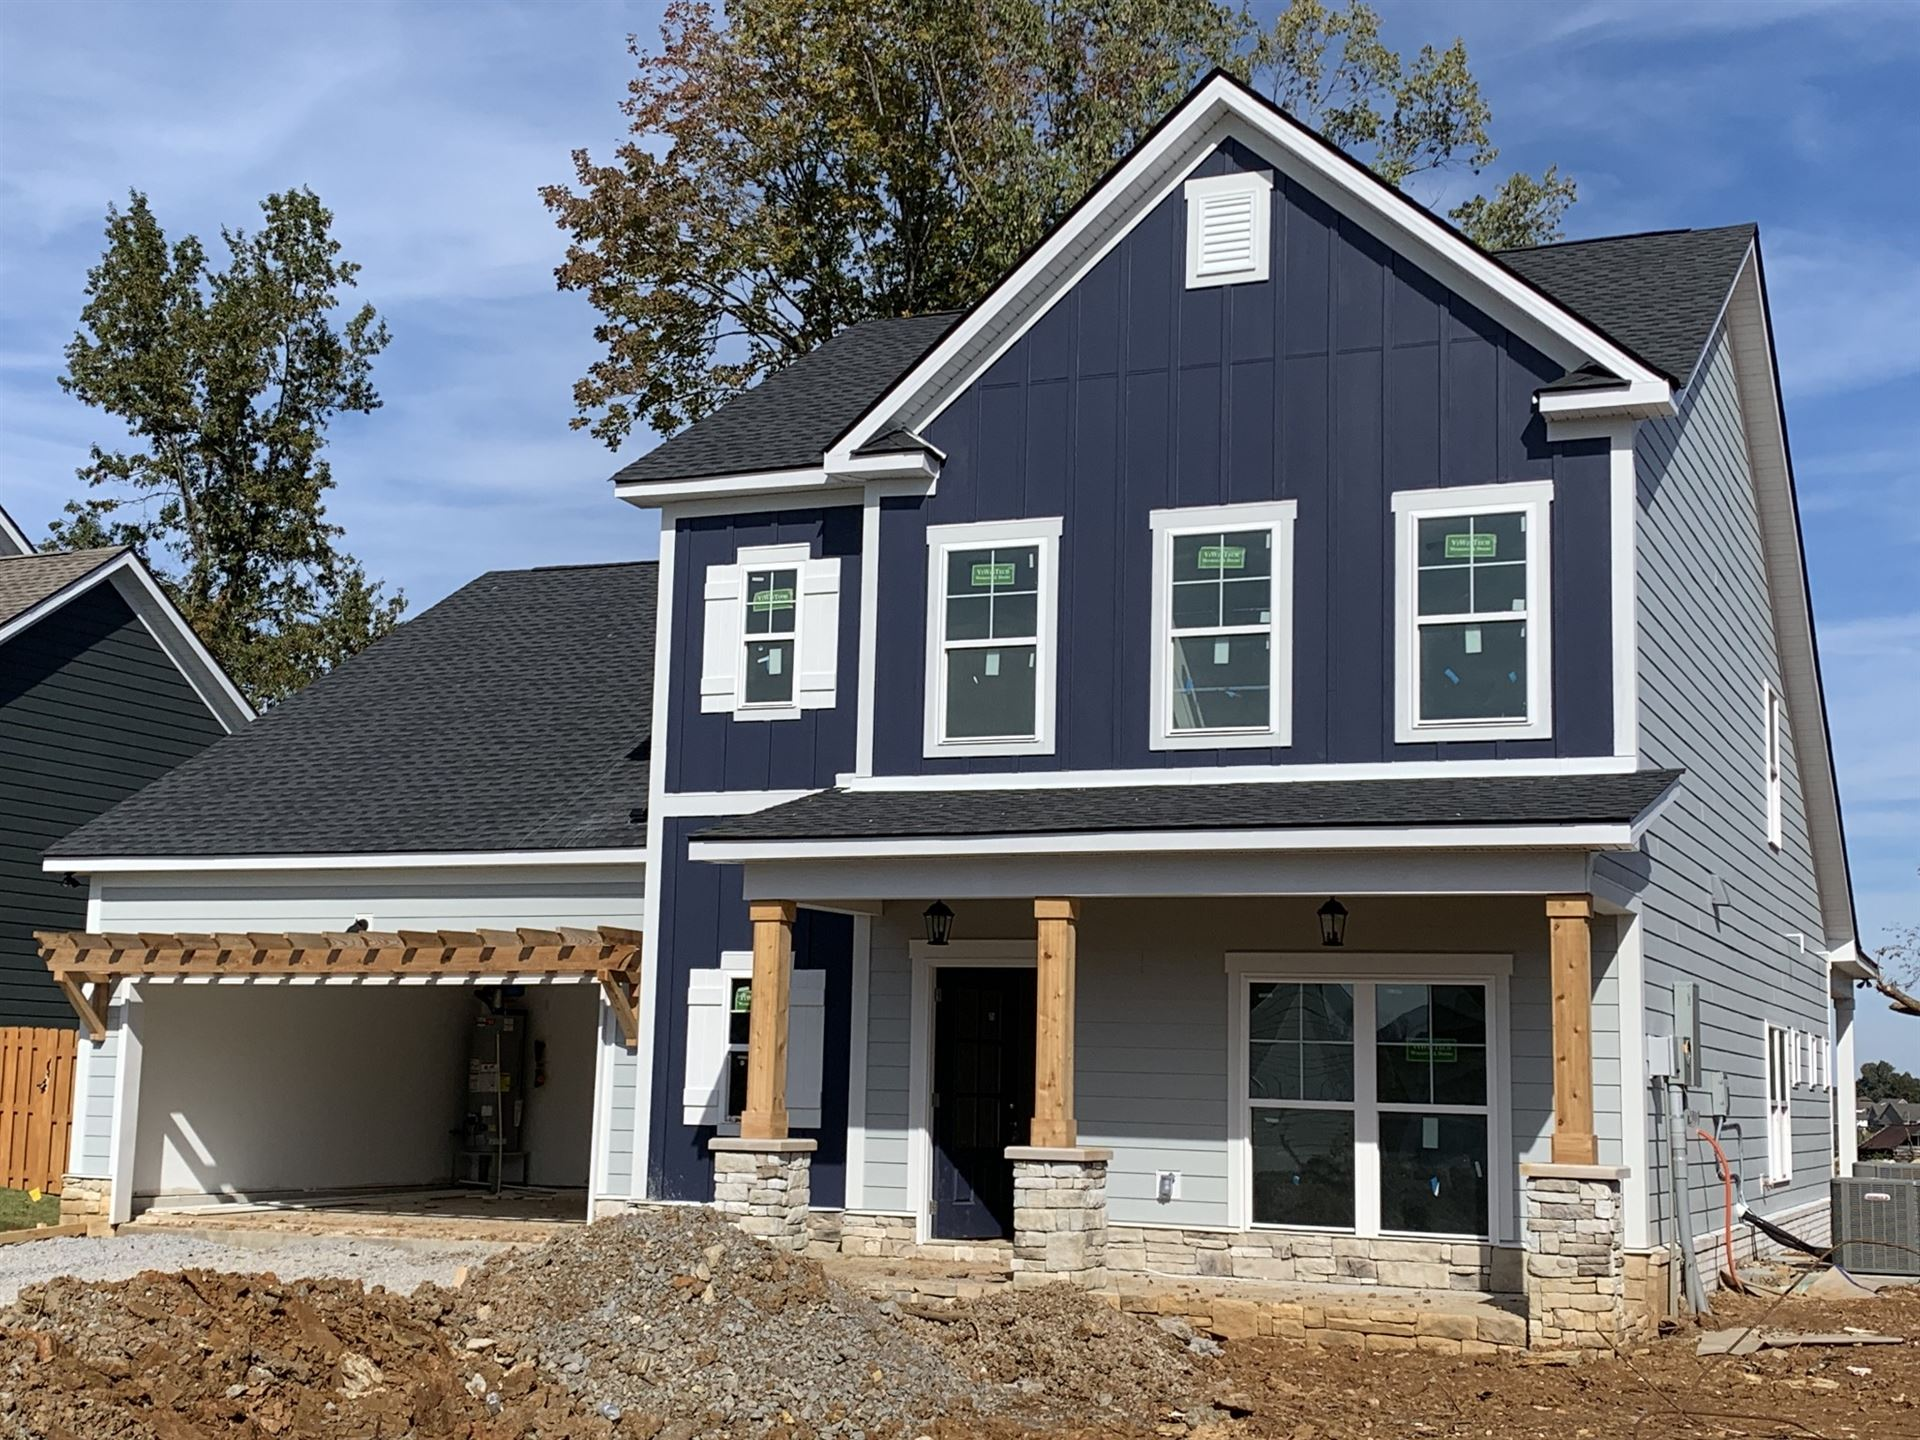 6459 Desmond Ave, Murfreesboro, TN 37128 - MLS#: 2296777